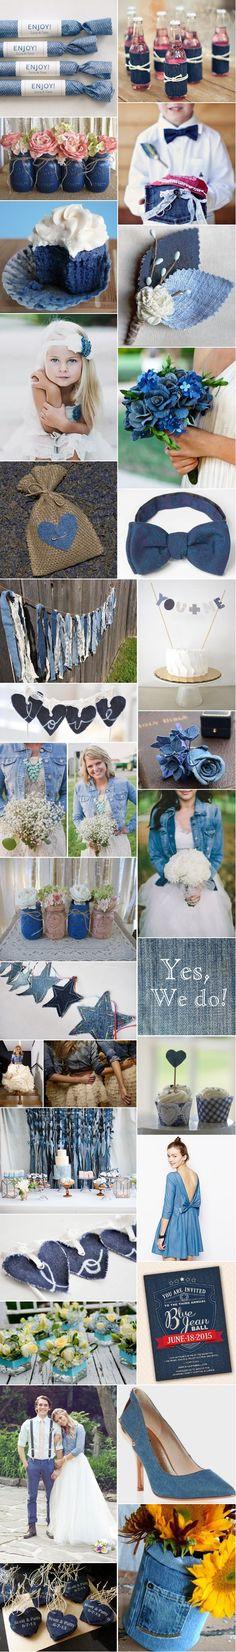 Dites oui à Lily [Inspiration] Mariage jean denim Wedding Dresses Photos, Blue Wedding Dresses, Wedding Colors, Wedding Ideas, Wedding Themes, Artisanats Denim, Denim And Lace, Blue Jean Wedding, Denim Baby Shower